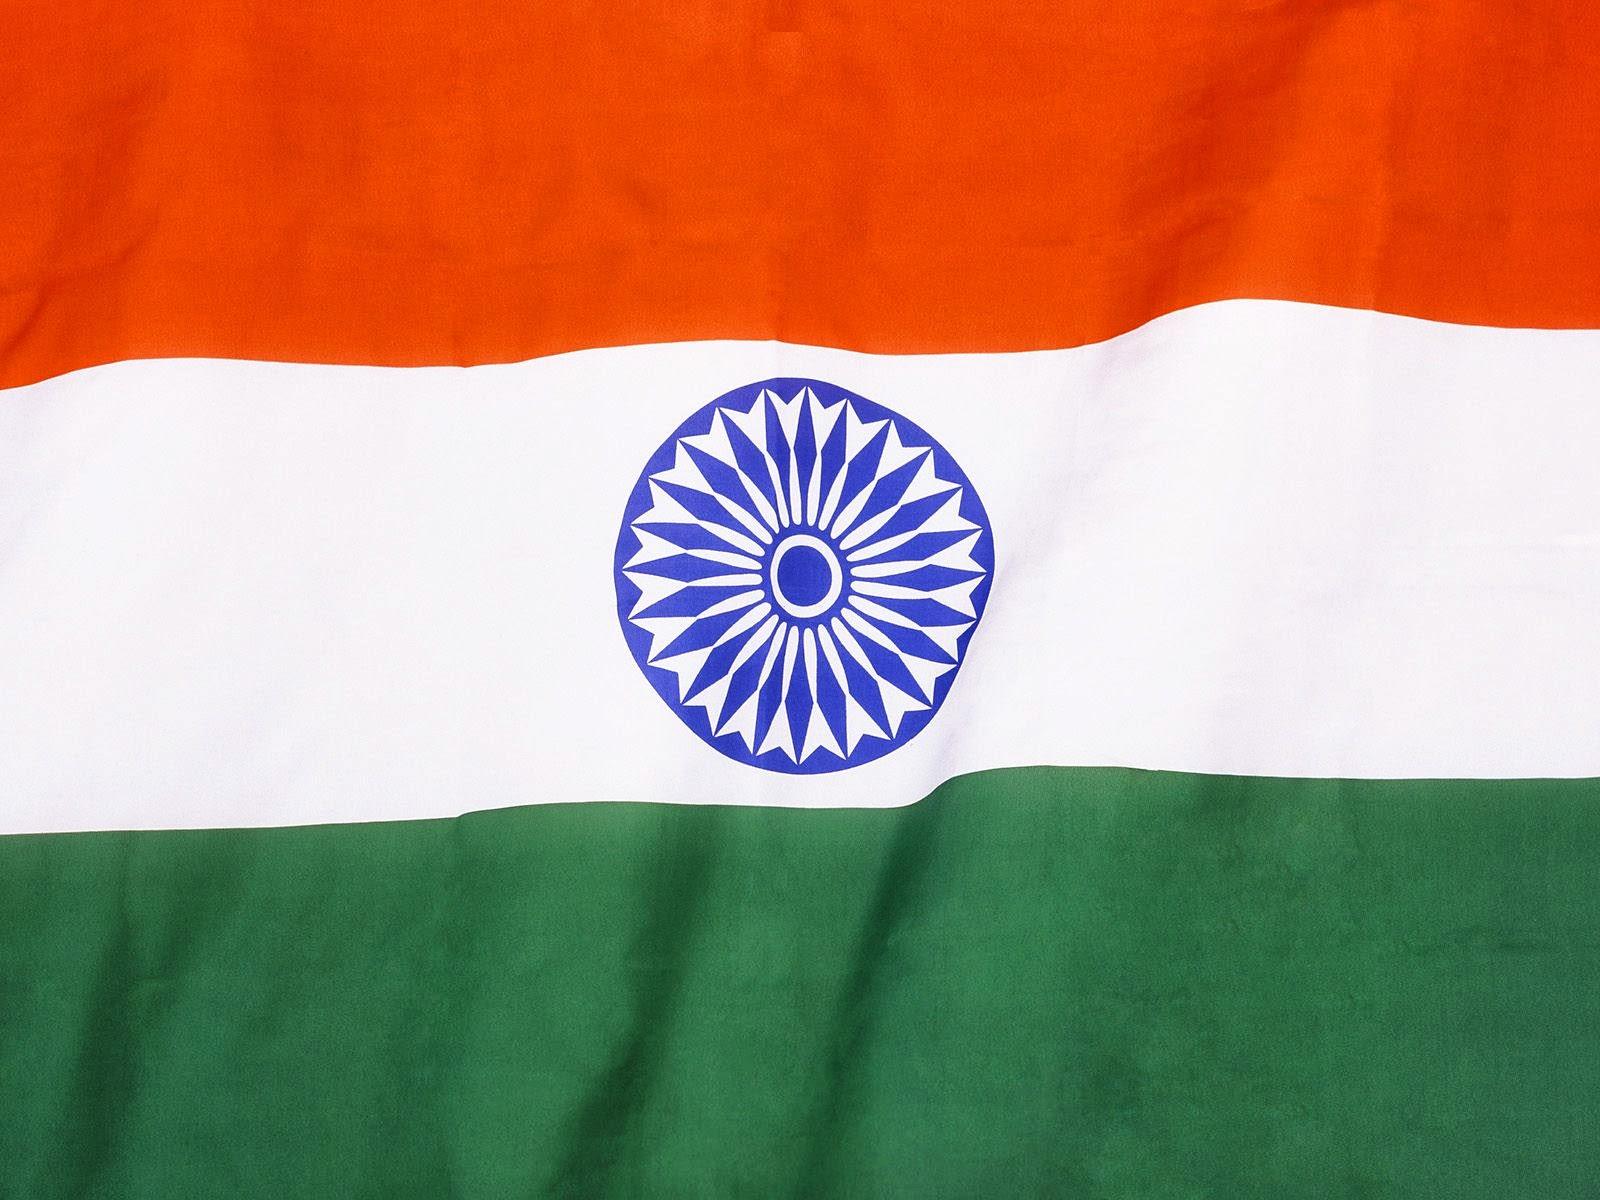 Indian Flag Animated: Indian Flag Animated Wallpaper